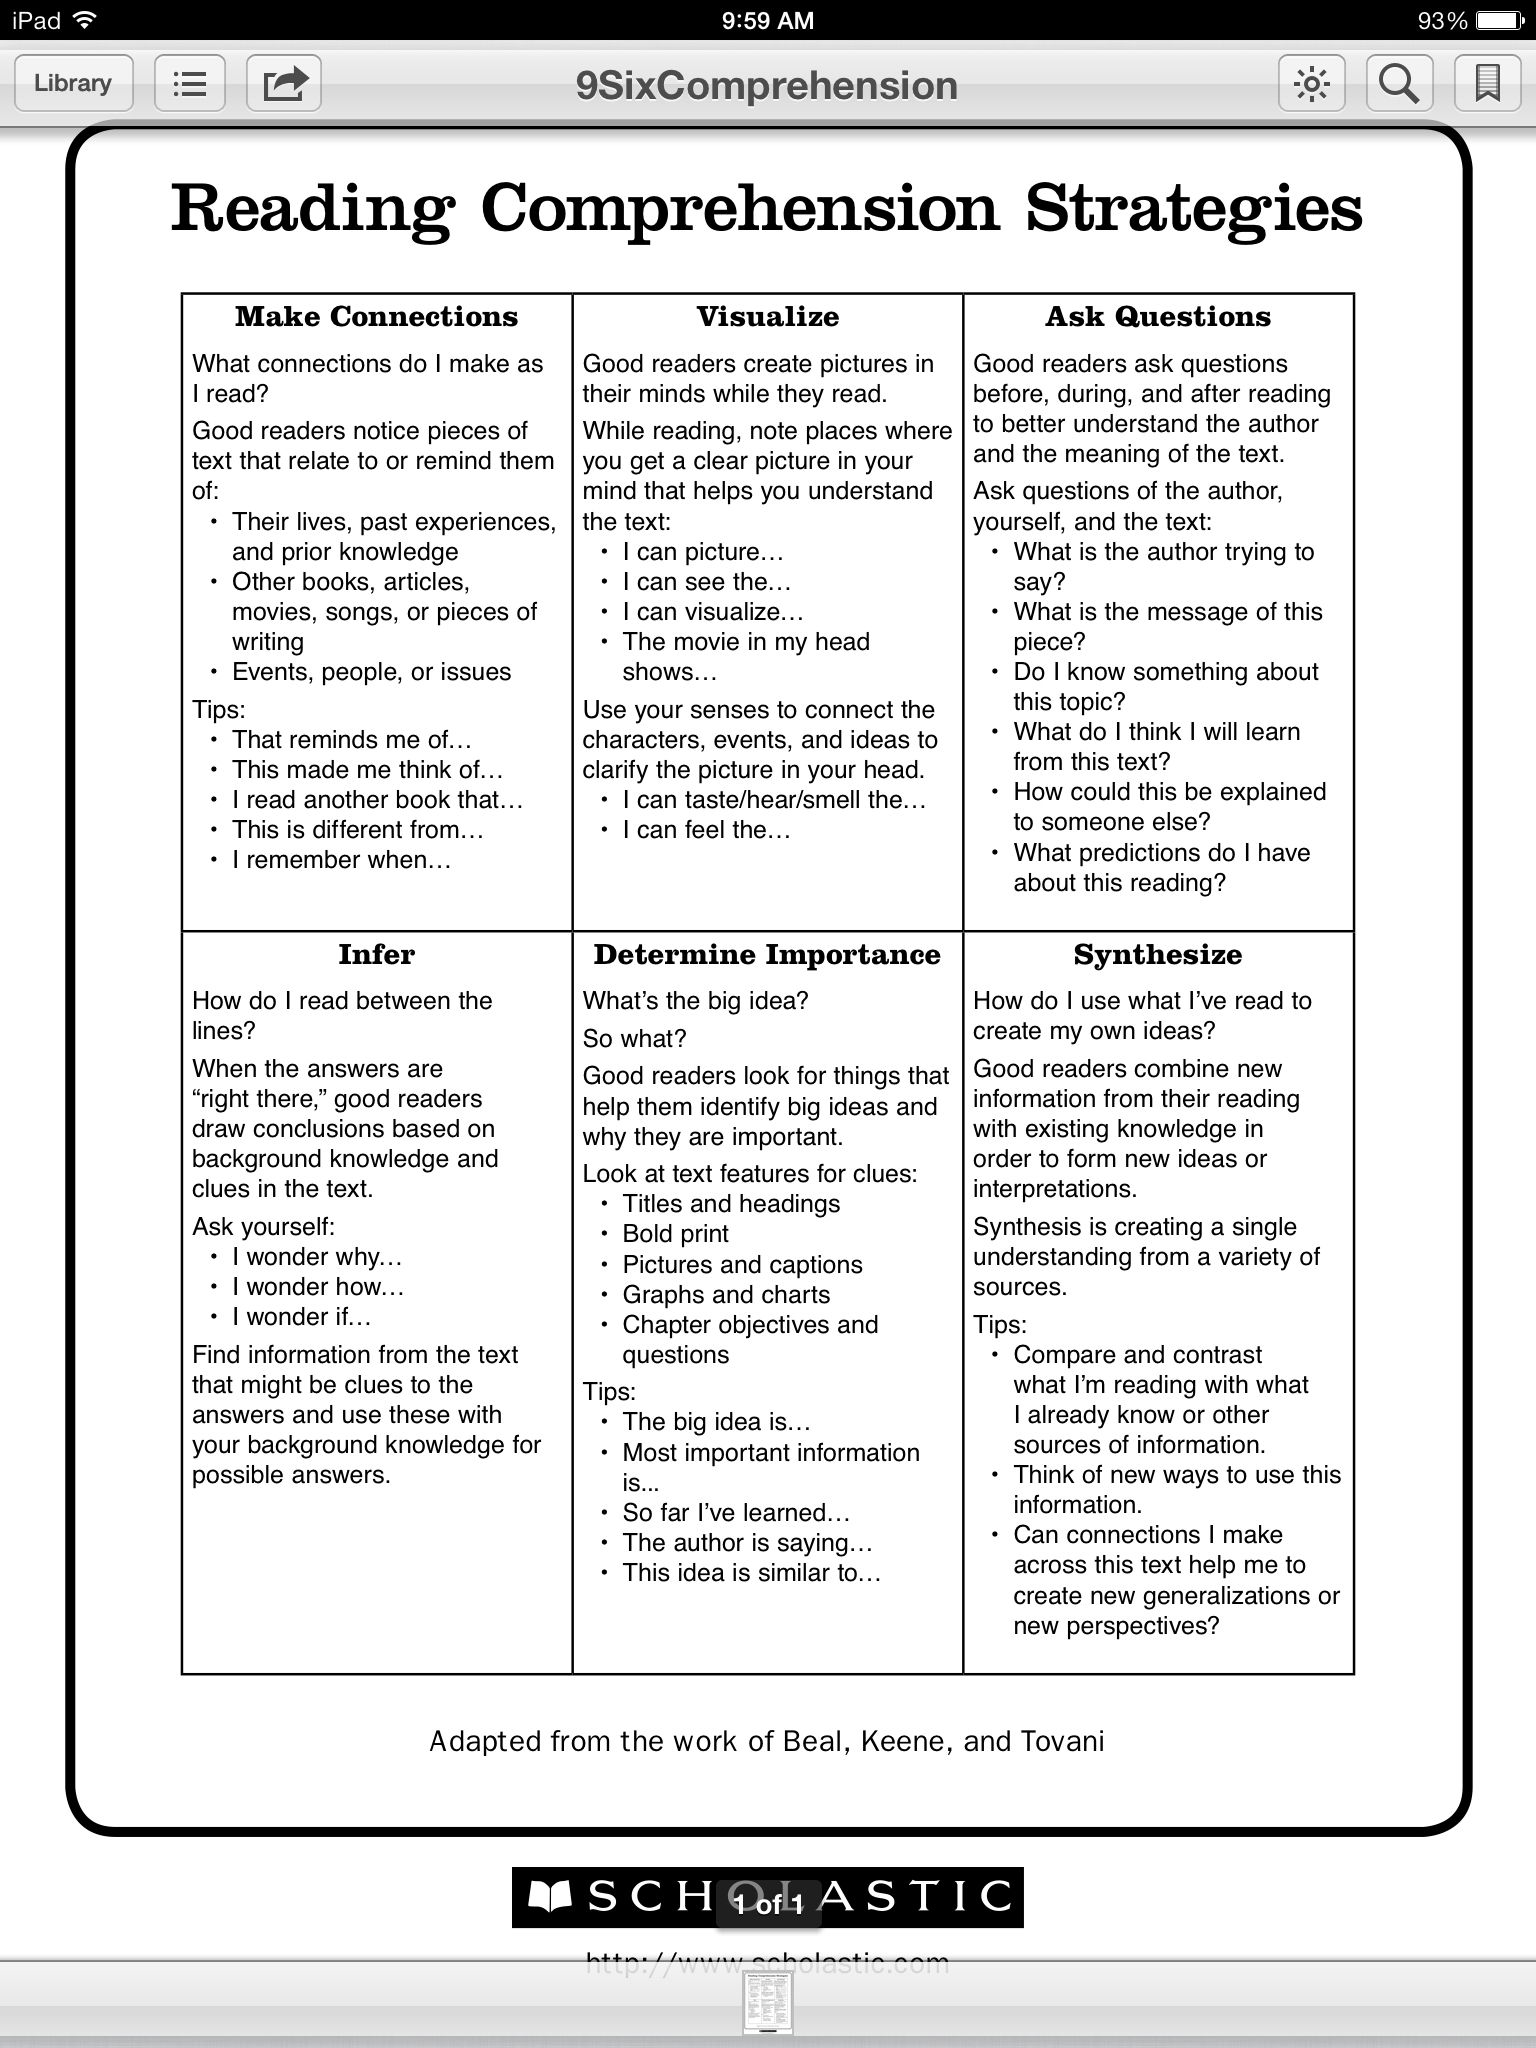 Comprehension Strategies Resource Http Teacher Scholastic Com Lessonplans Pdf Reading Comprehension Teaching Comprehension Reading Comprehension Strategies Reading comprehension objectives for